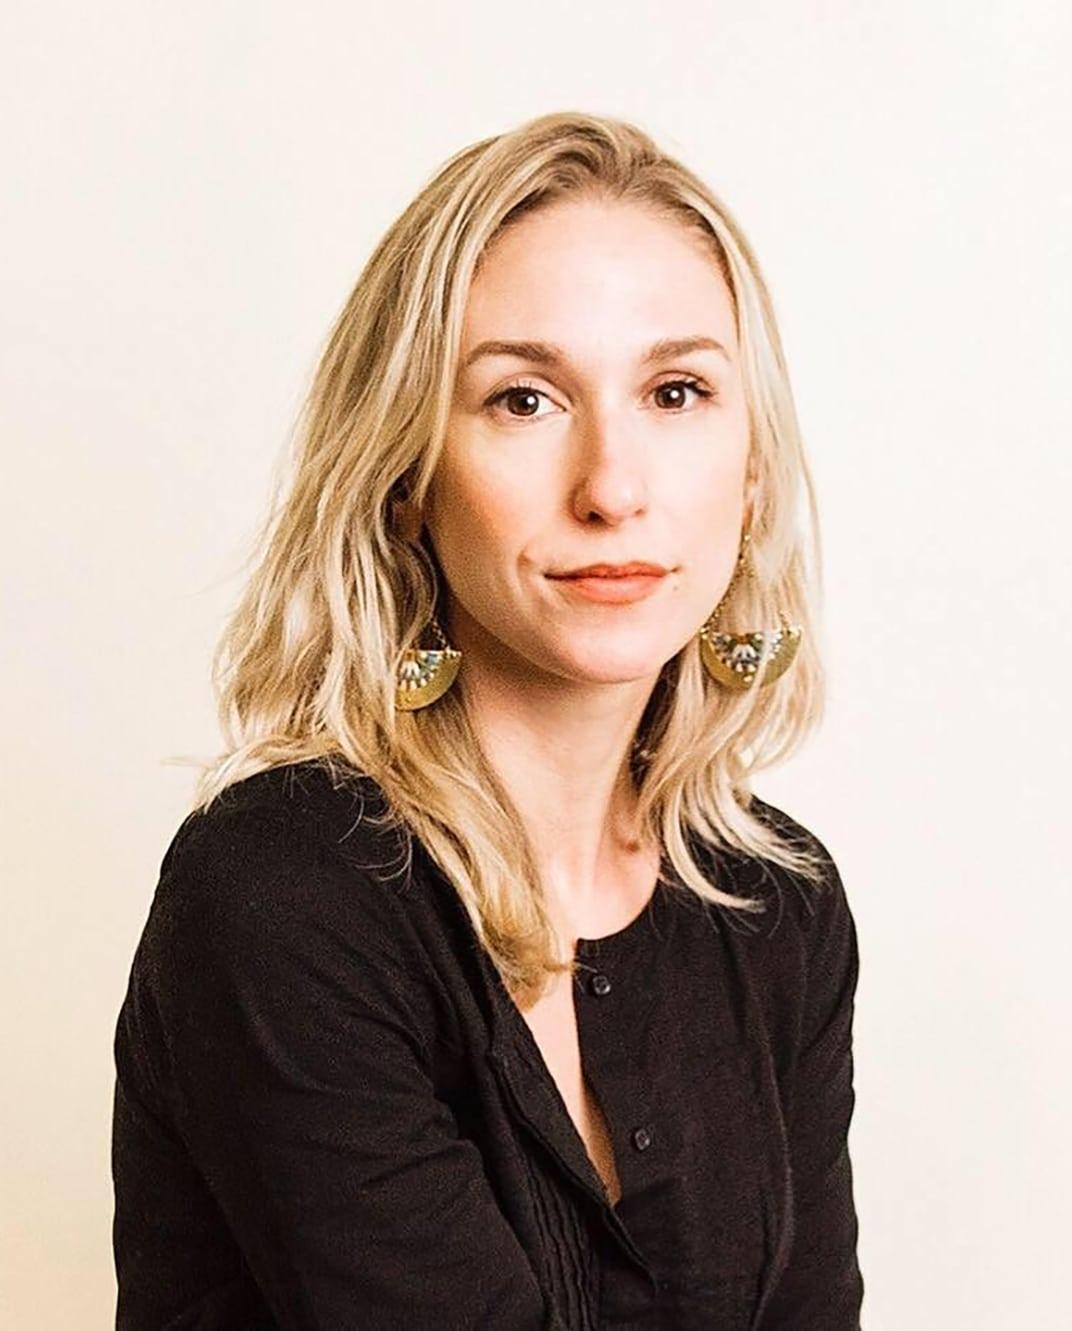 Headshot of Christina Wesley, owner of La Femme Boudoir